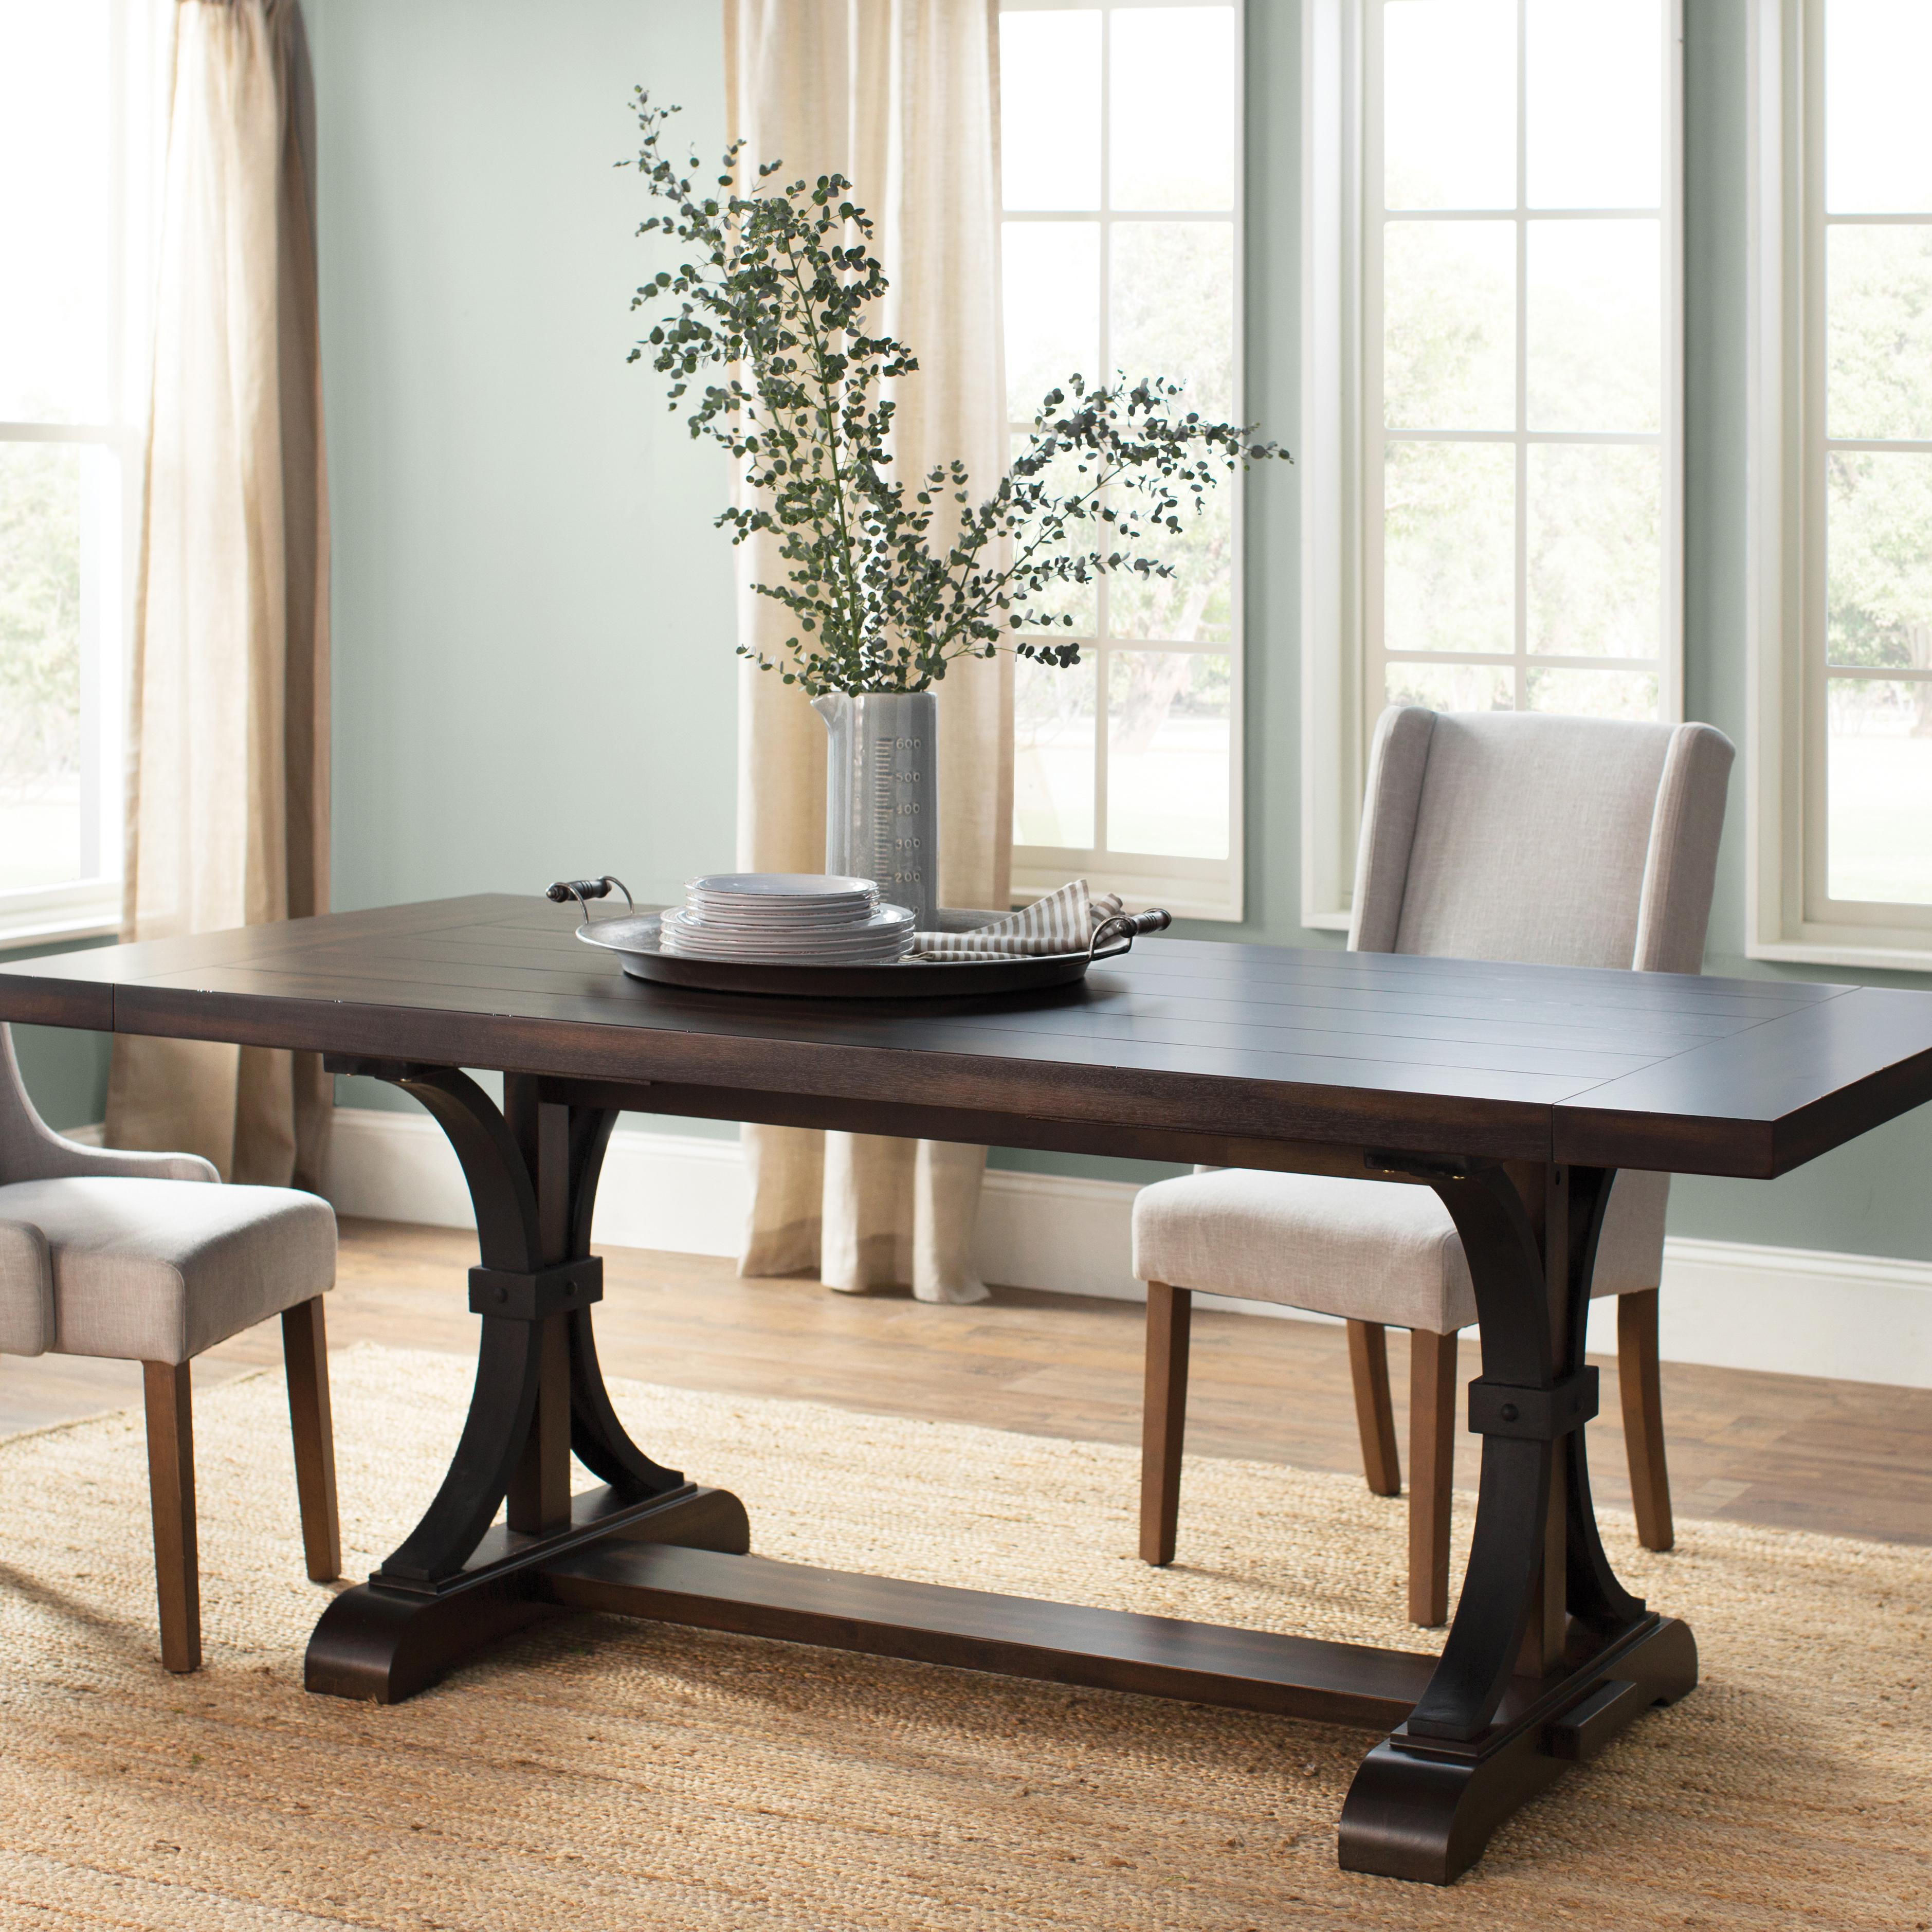 Farmhouse & Rustic Dining Room Furniture | Birch Lane